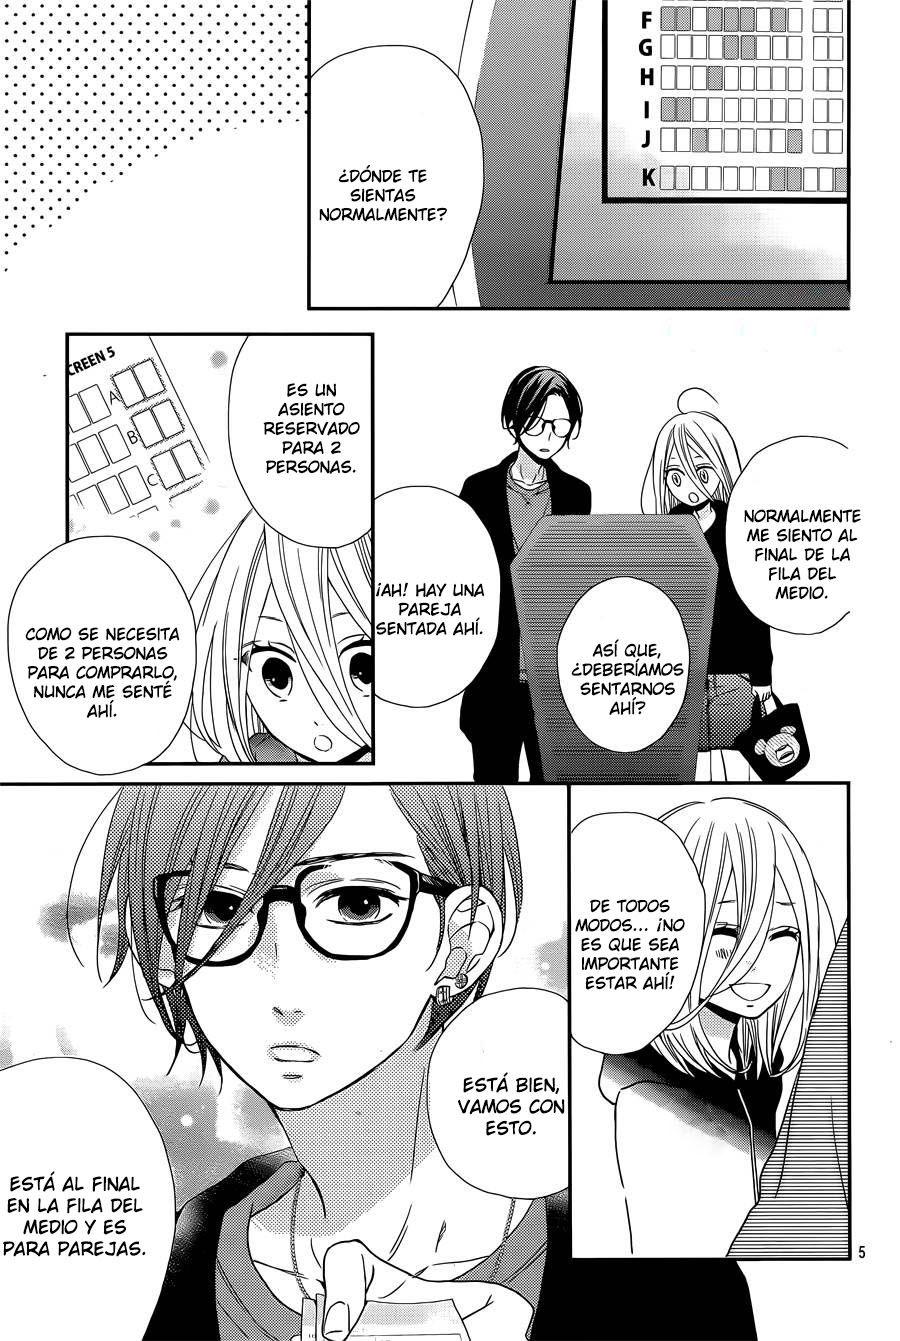 http://c5.ninemanga.com/es_manga/19/19347/473496/742141ceda6b8f6786609d31c8ef129f.jpg Page 6